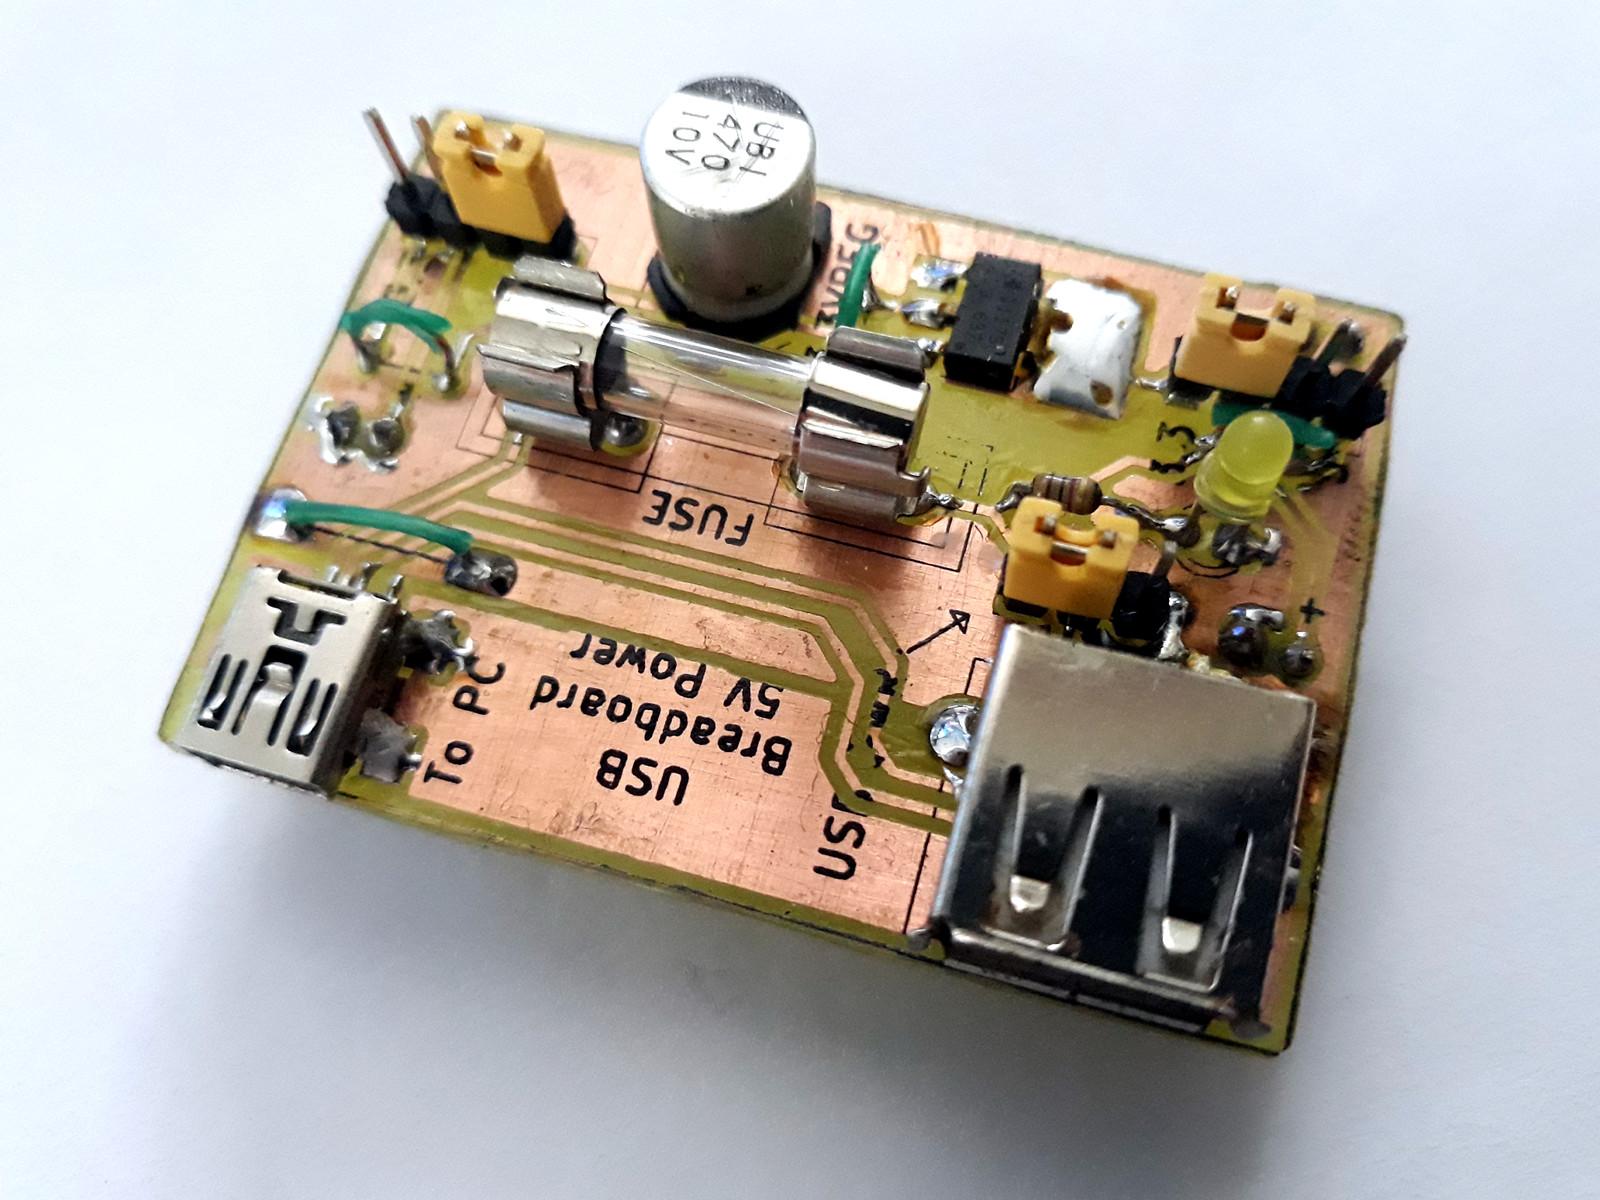 usb power supply for breadboard [ 1600 x 1200 Pixel ]